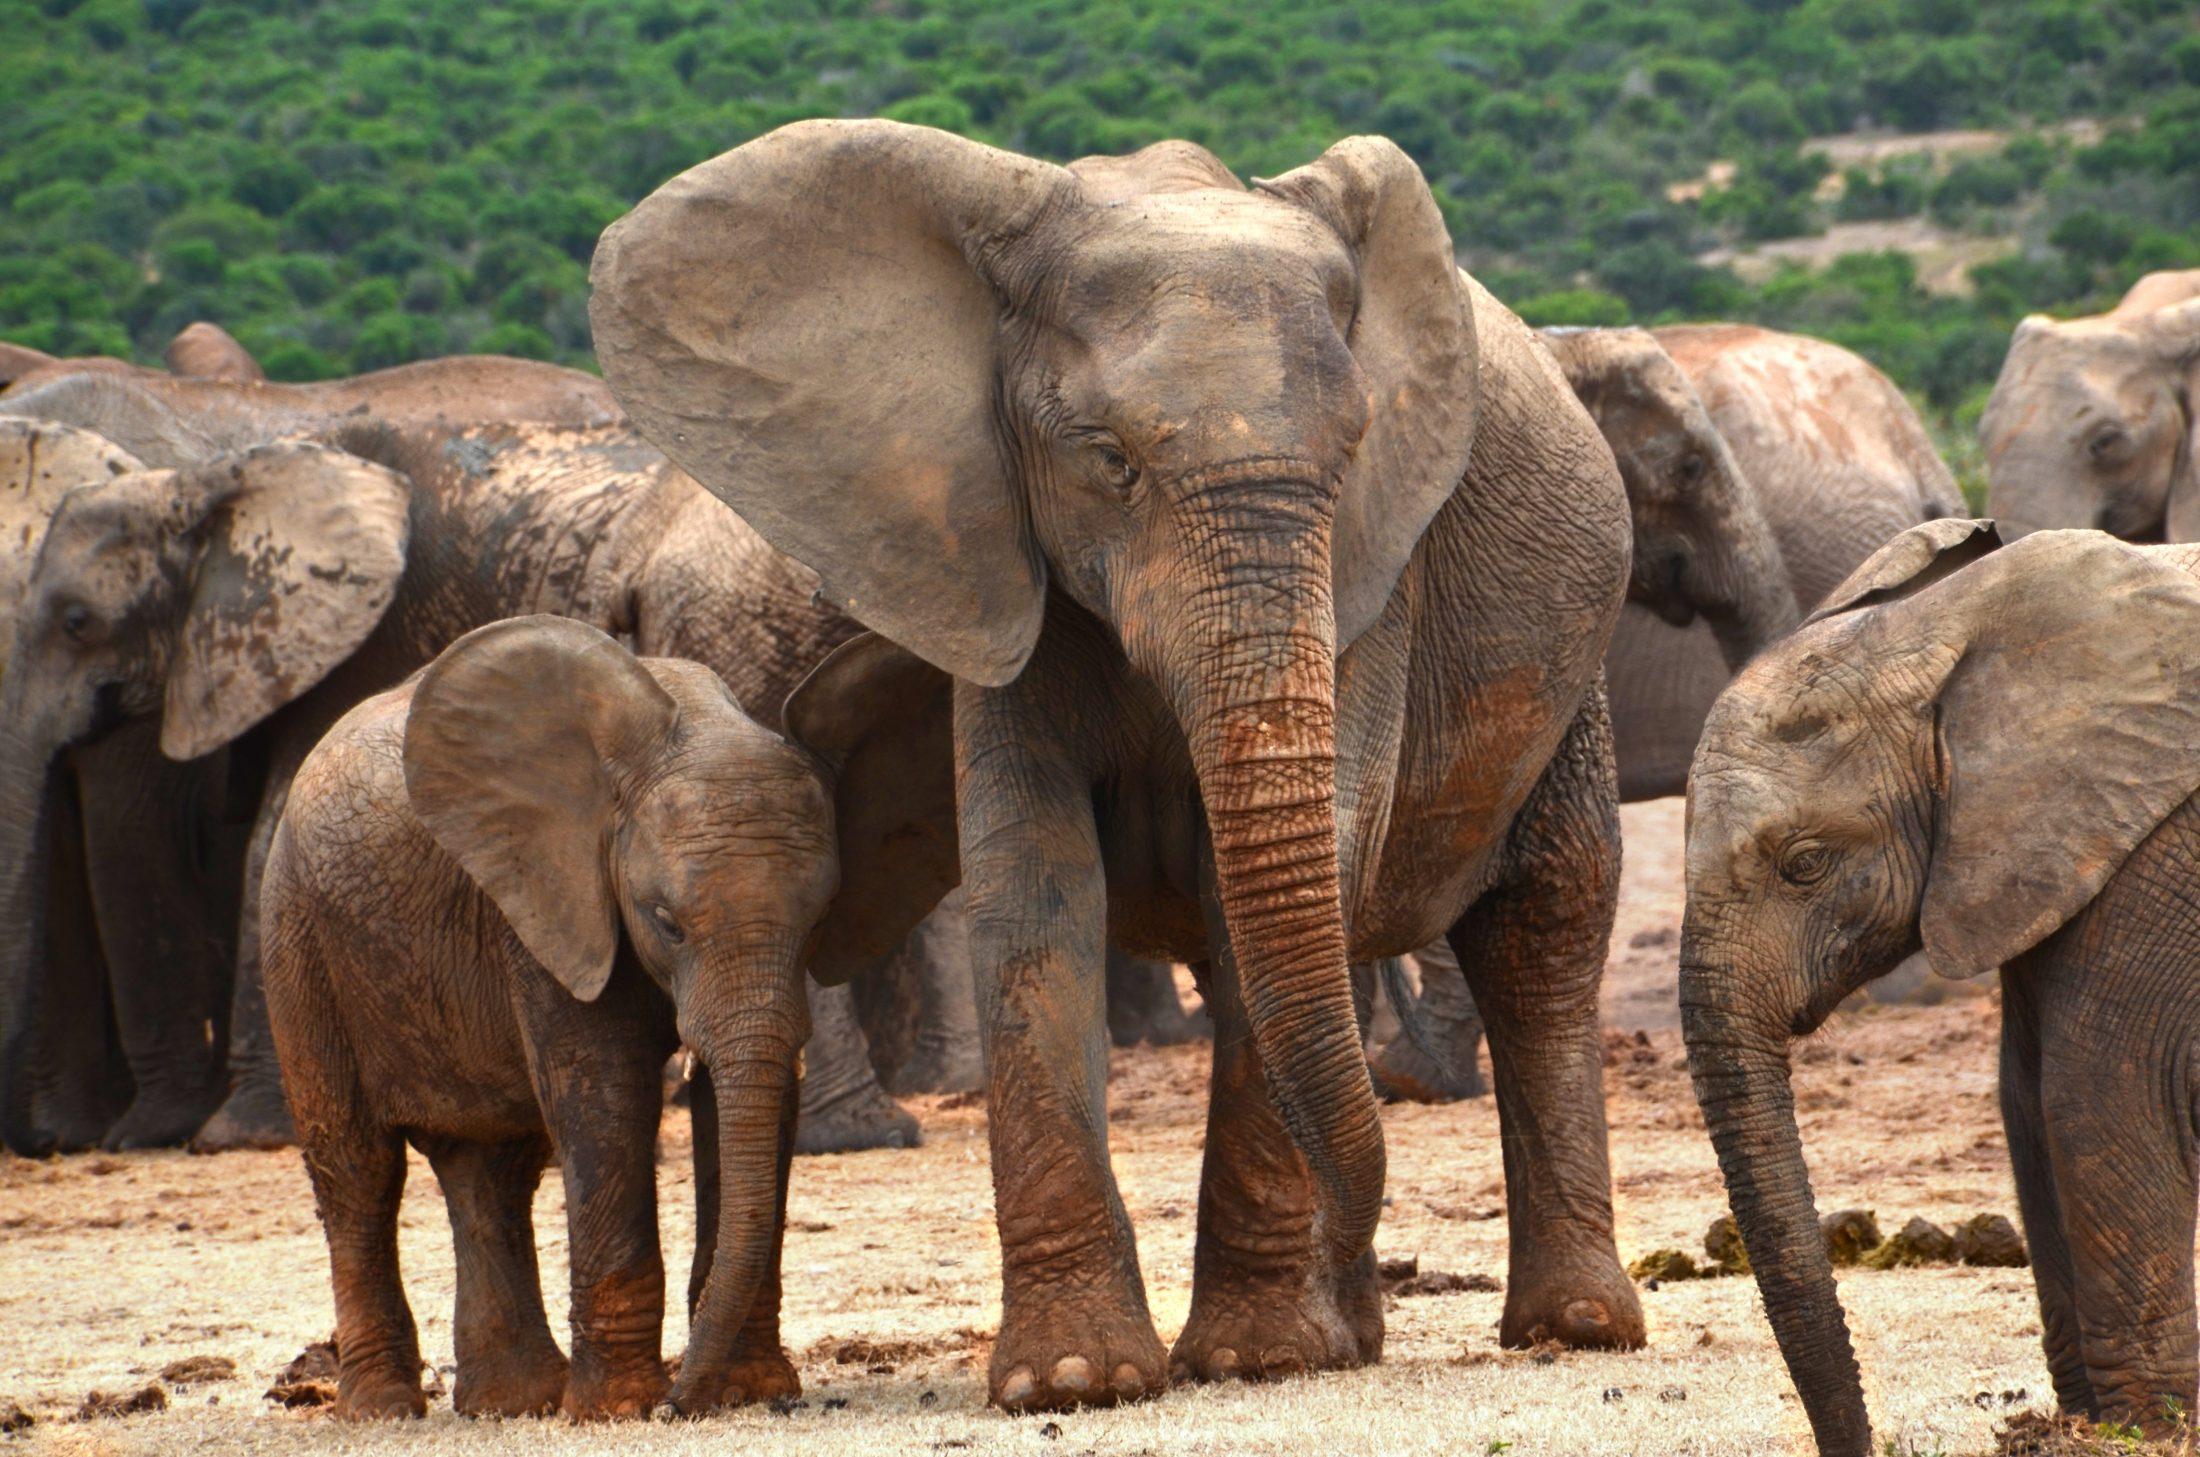 Elephant herd; Image via Pixabay